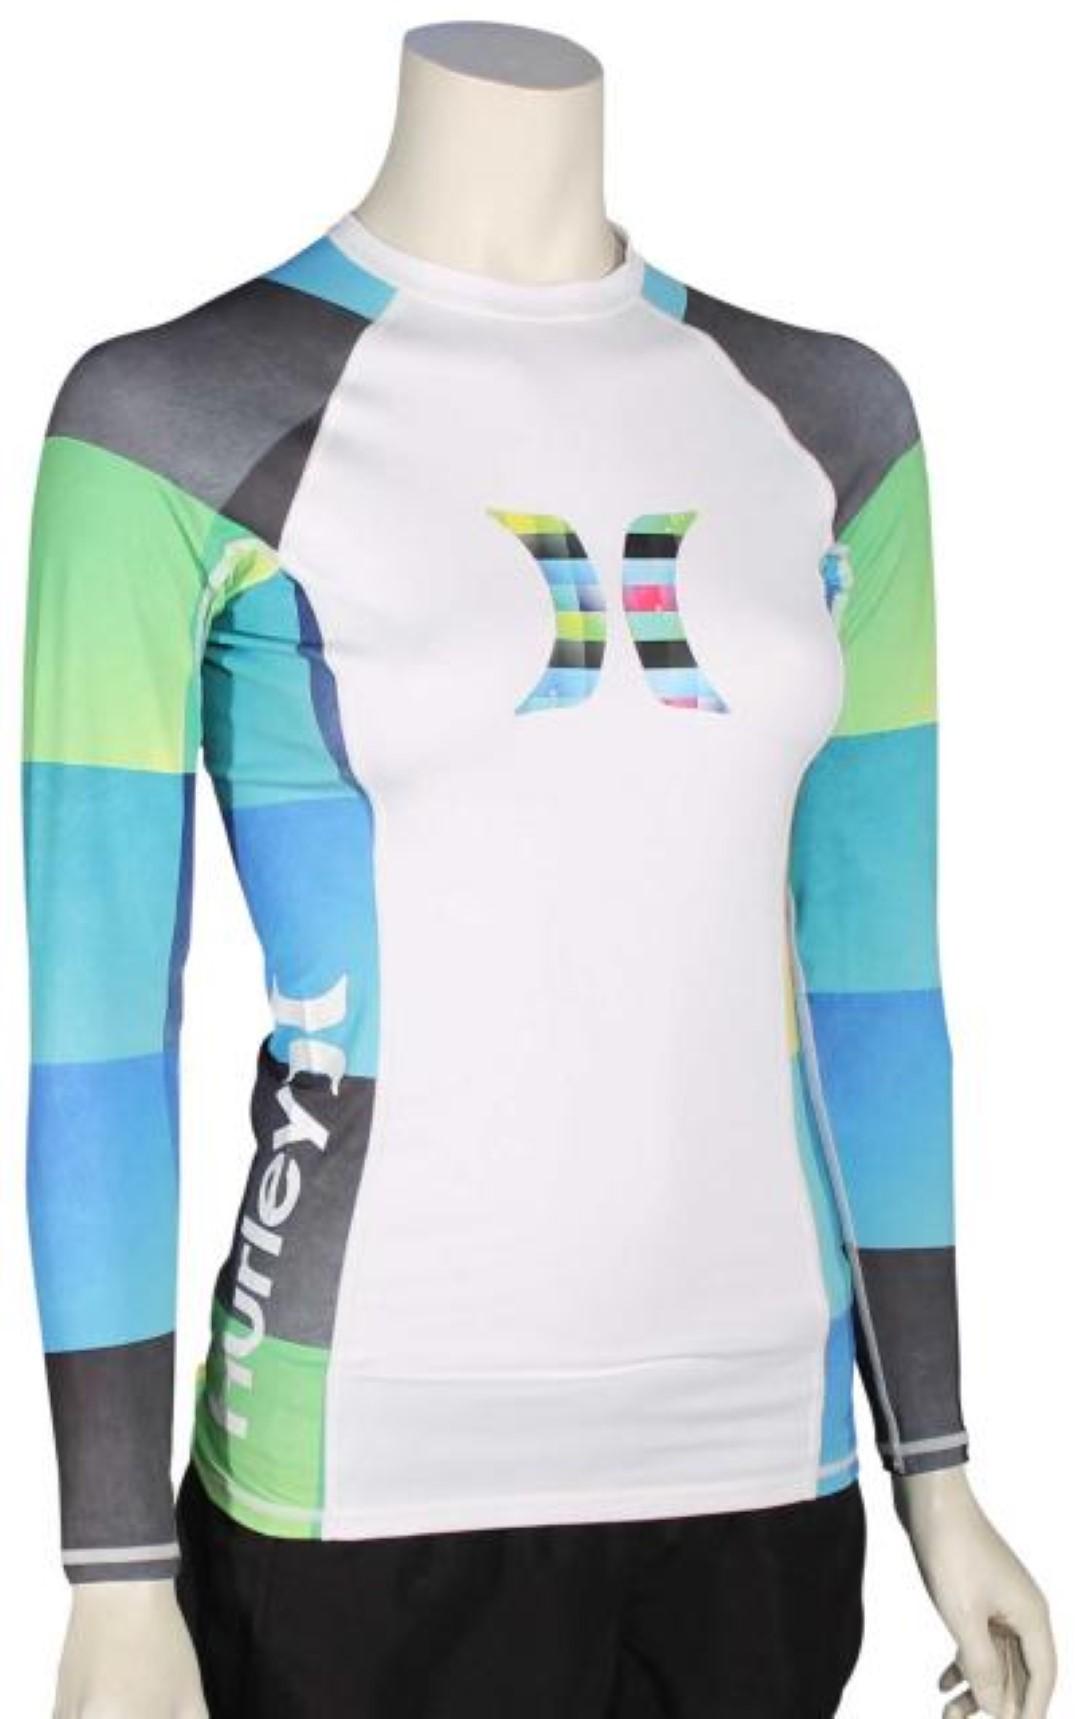 Hurley womens one only long sleeve rashguard grg0000090 for Womens rash guard shirts